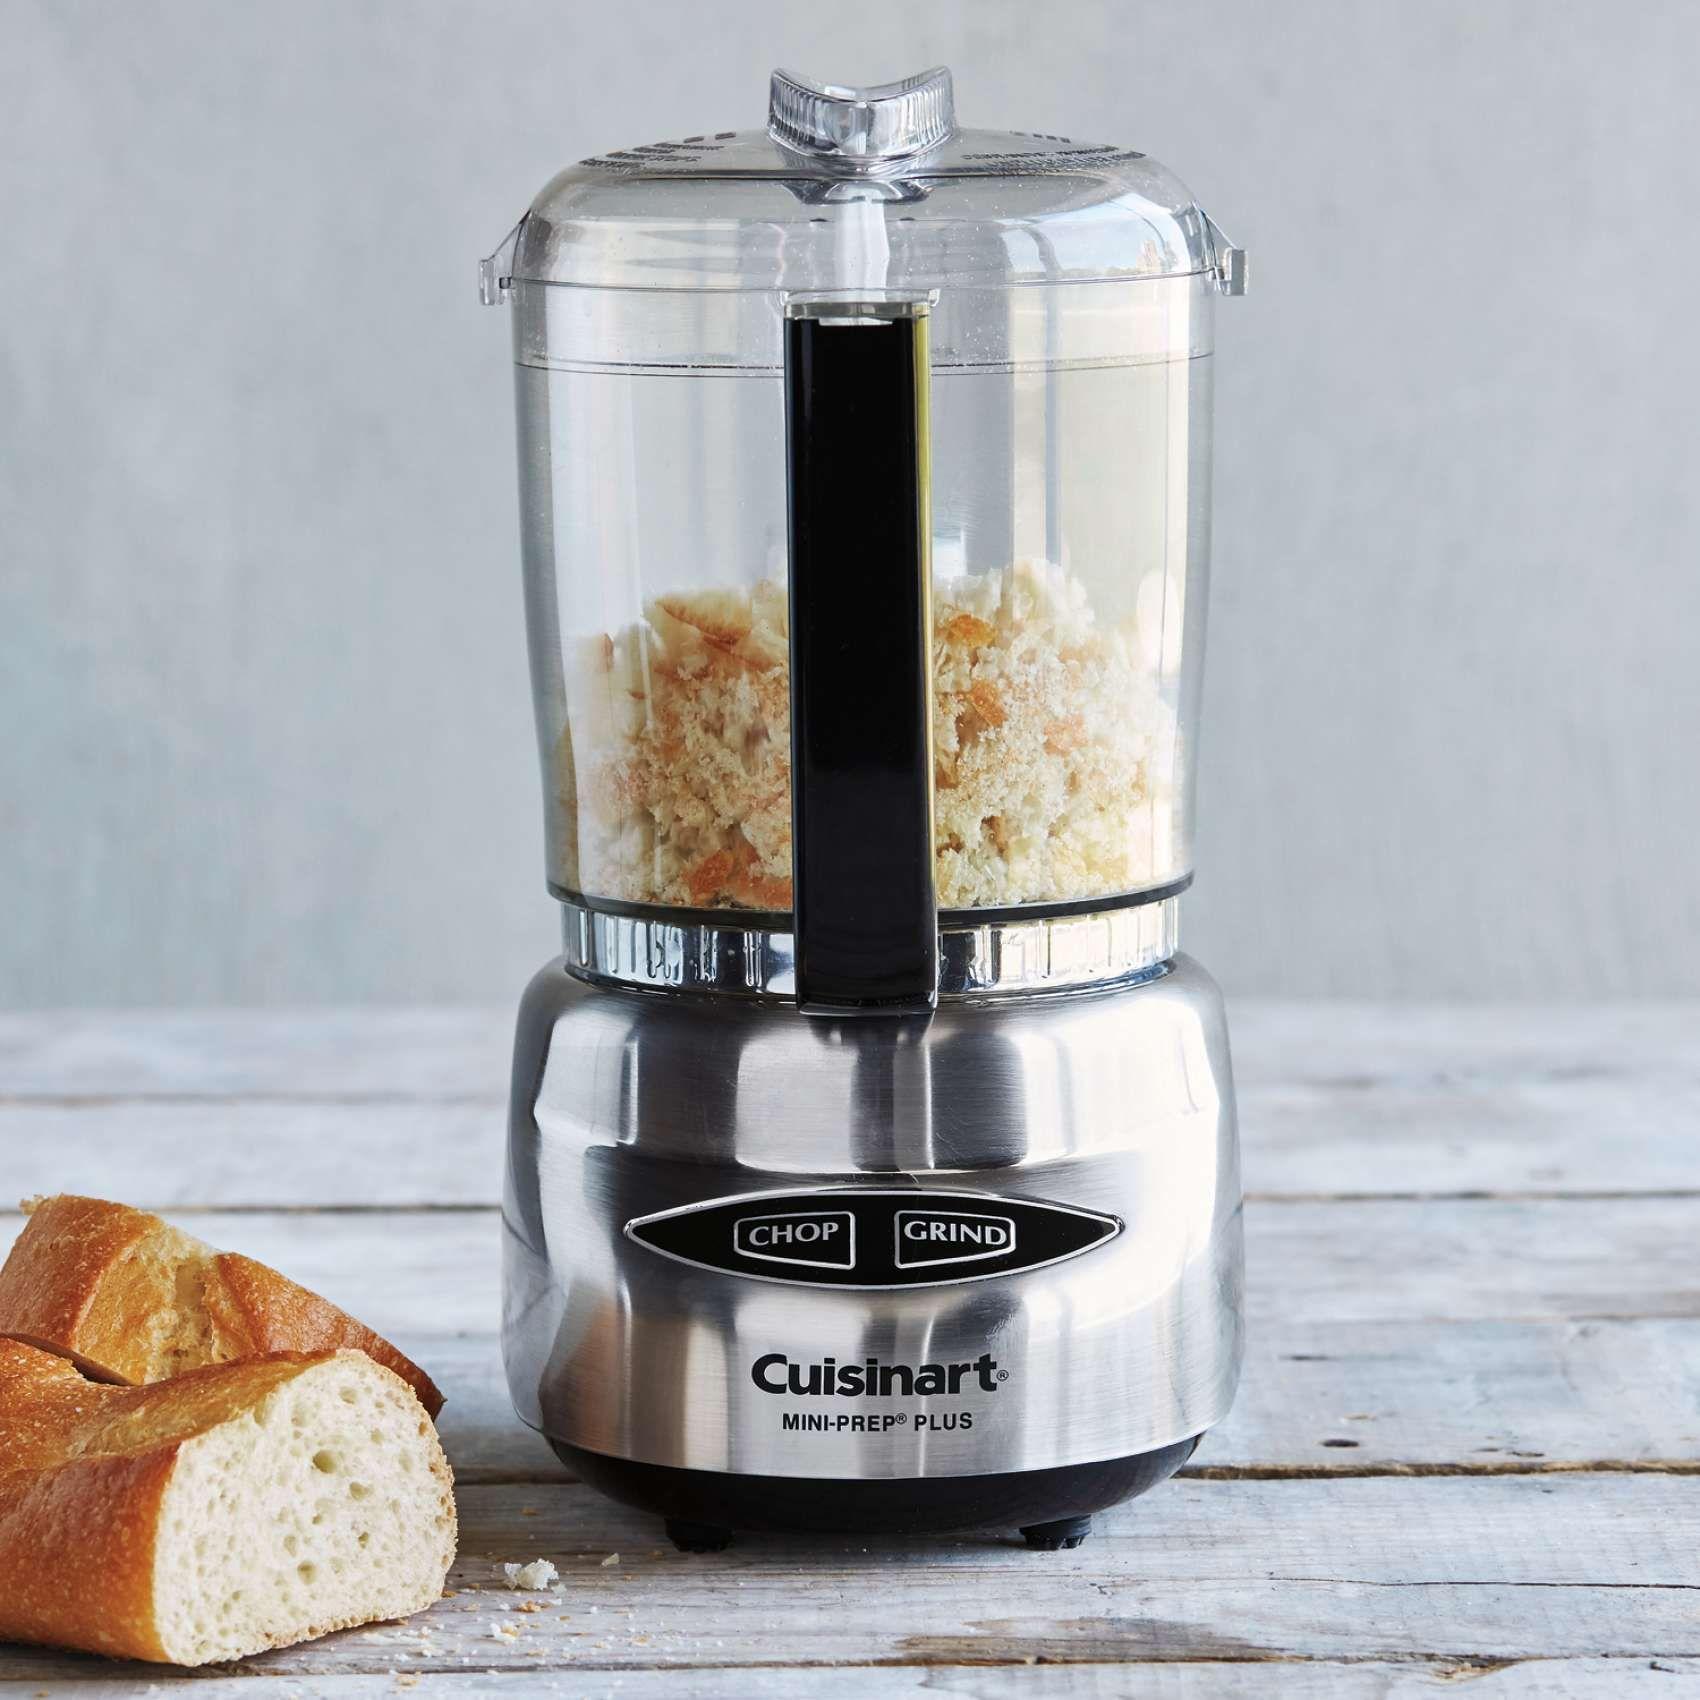 Cuisinart 4 Cup Mini Prep Plus Food Processor